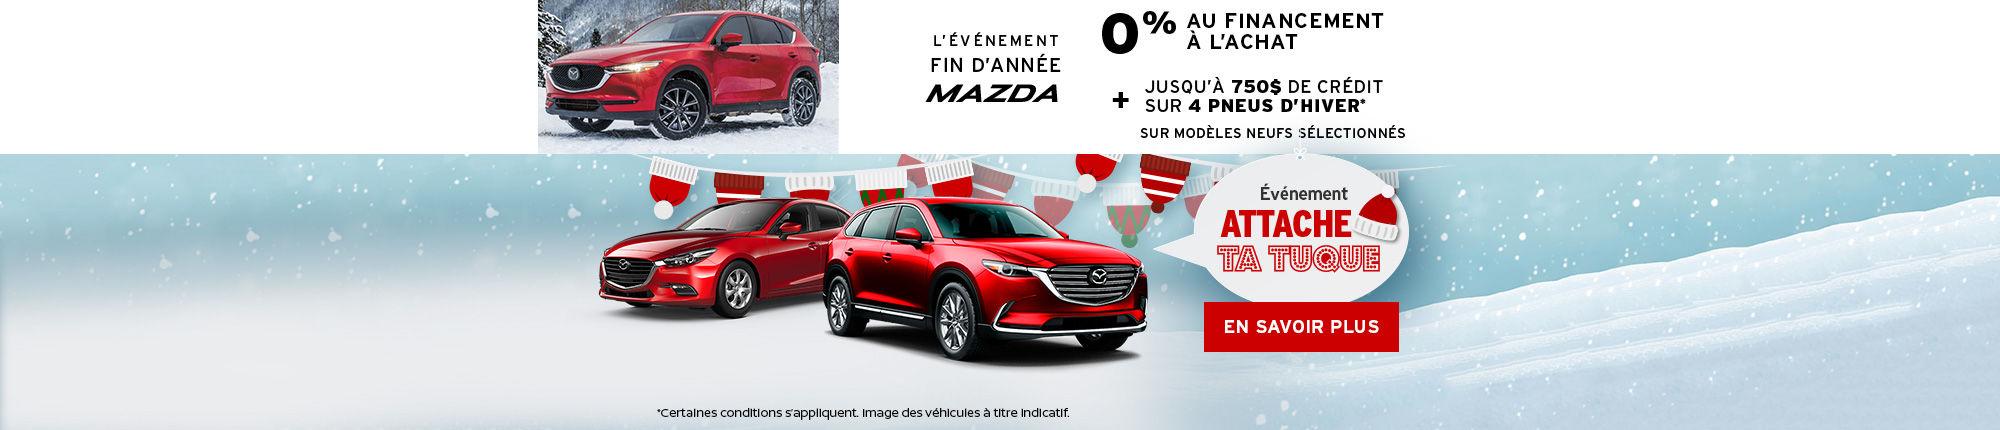 L'événement Mazda